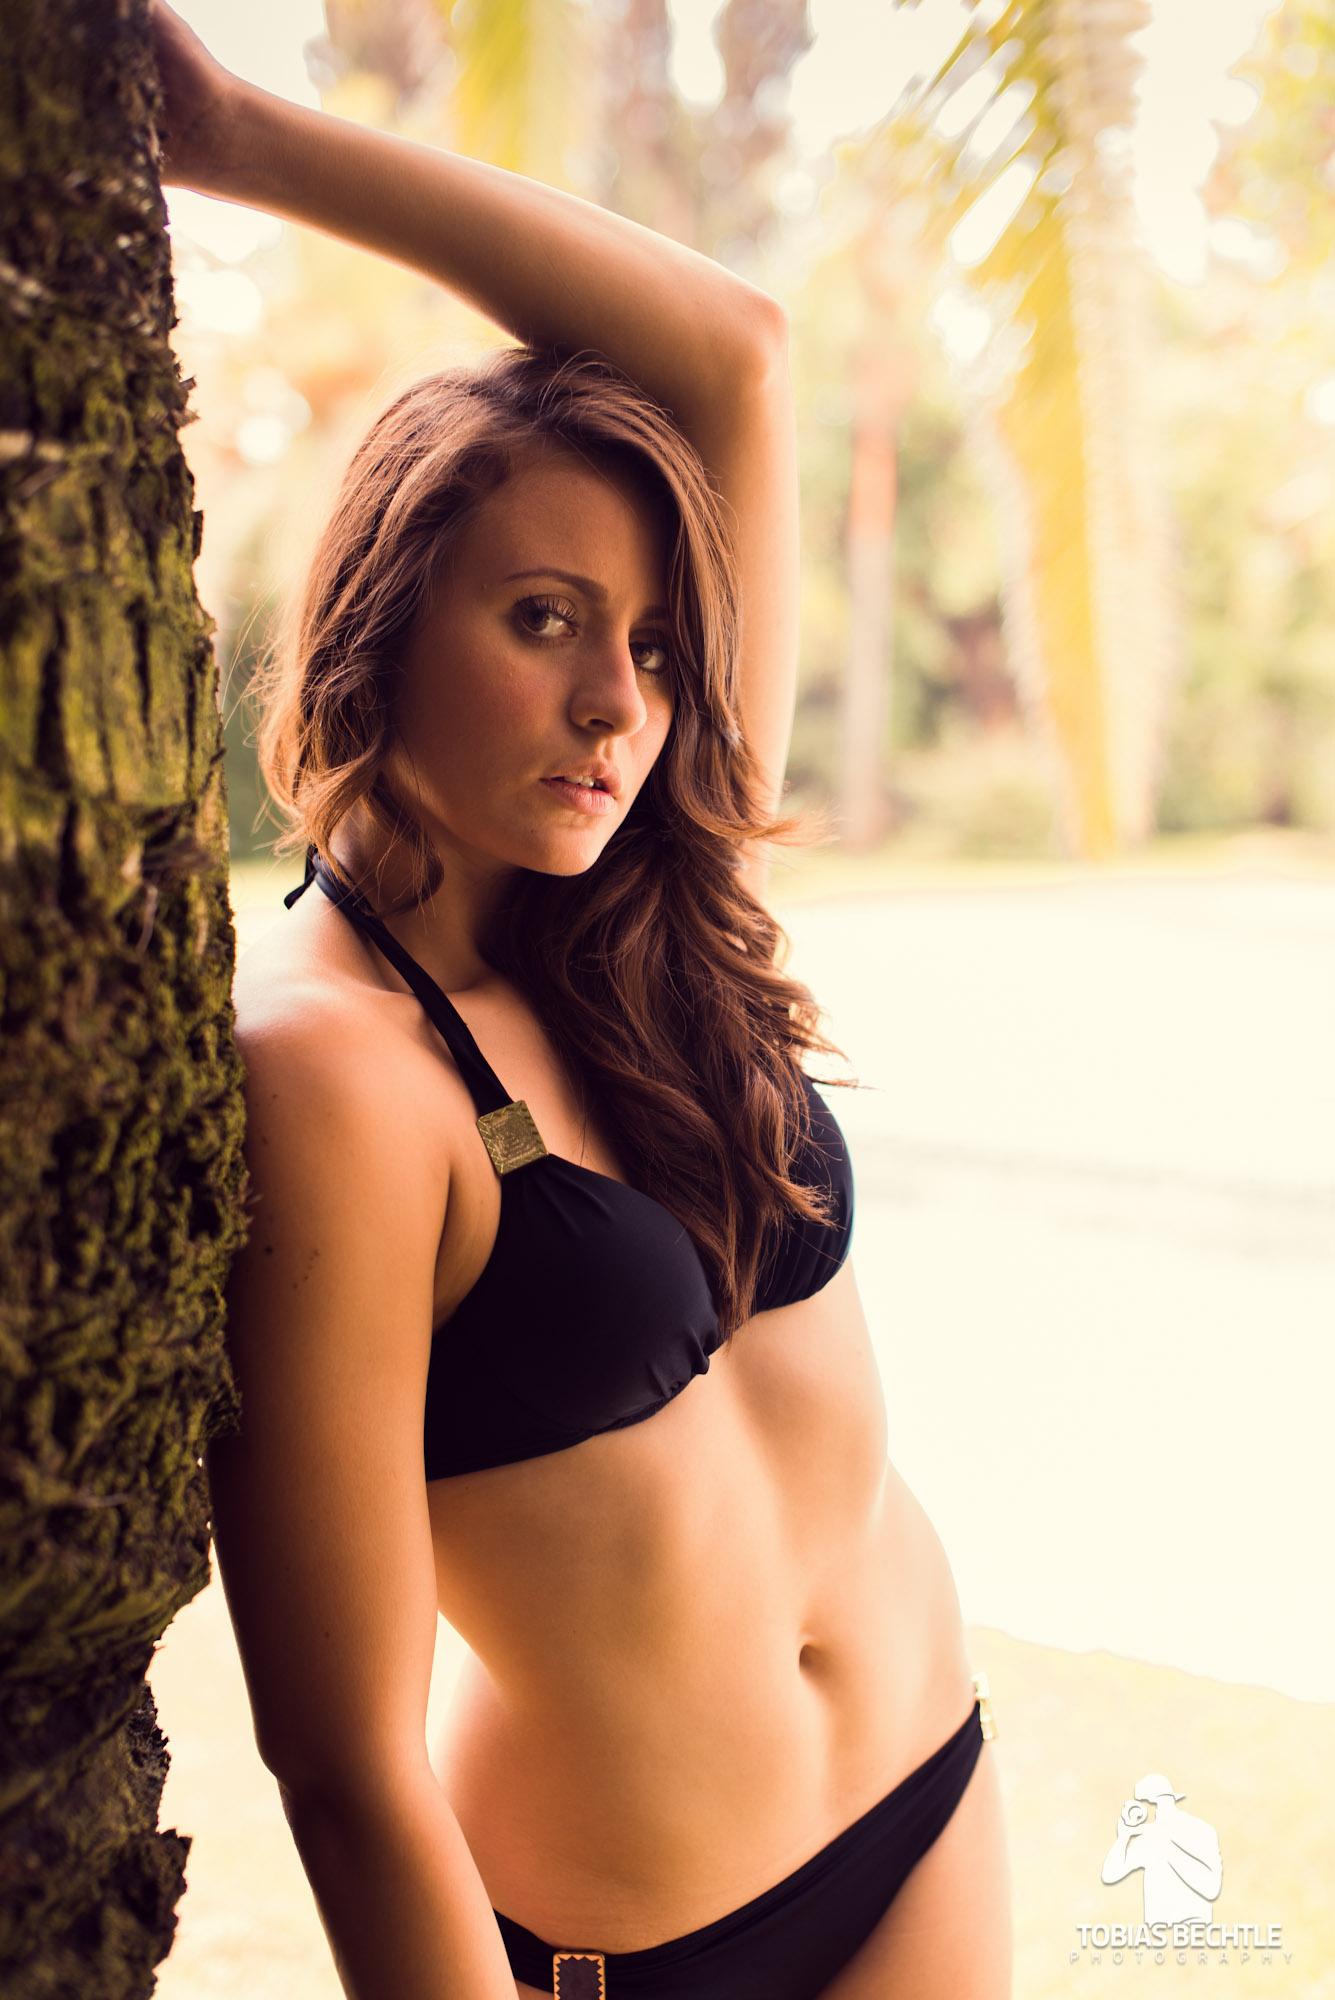 Lucy Malaga #6